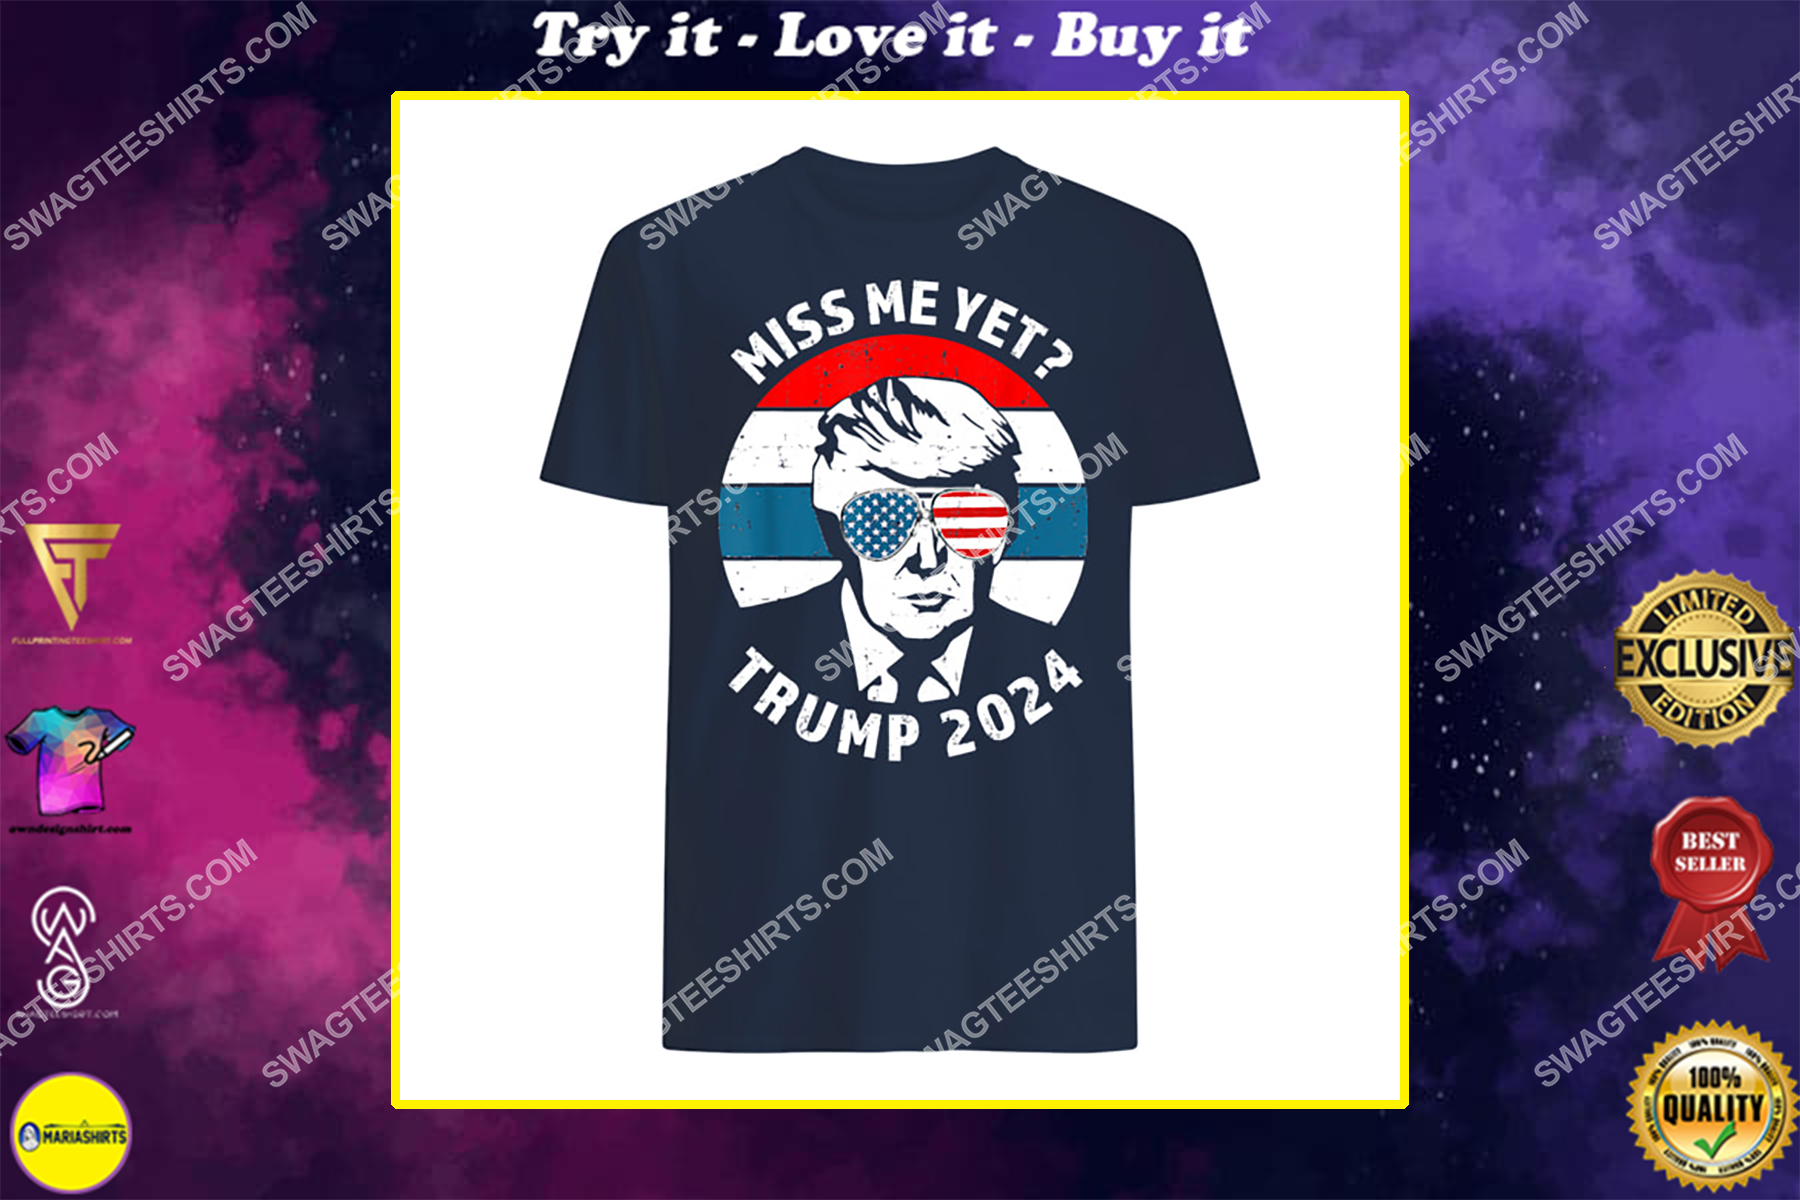 miss me yet donald trump is still my president 2024 shirt